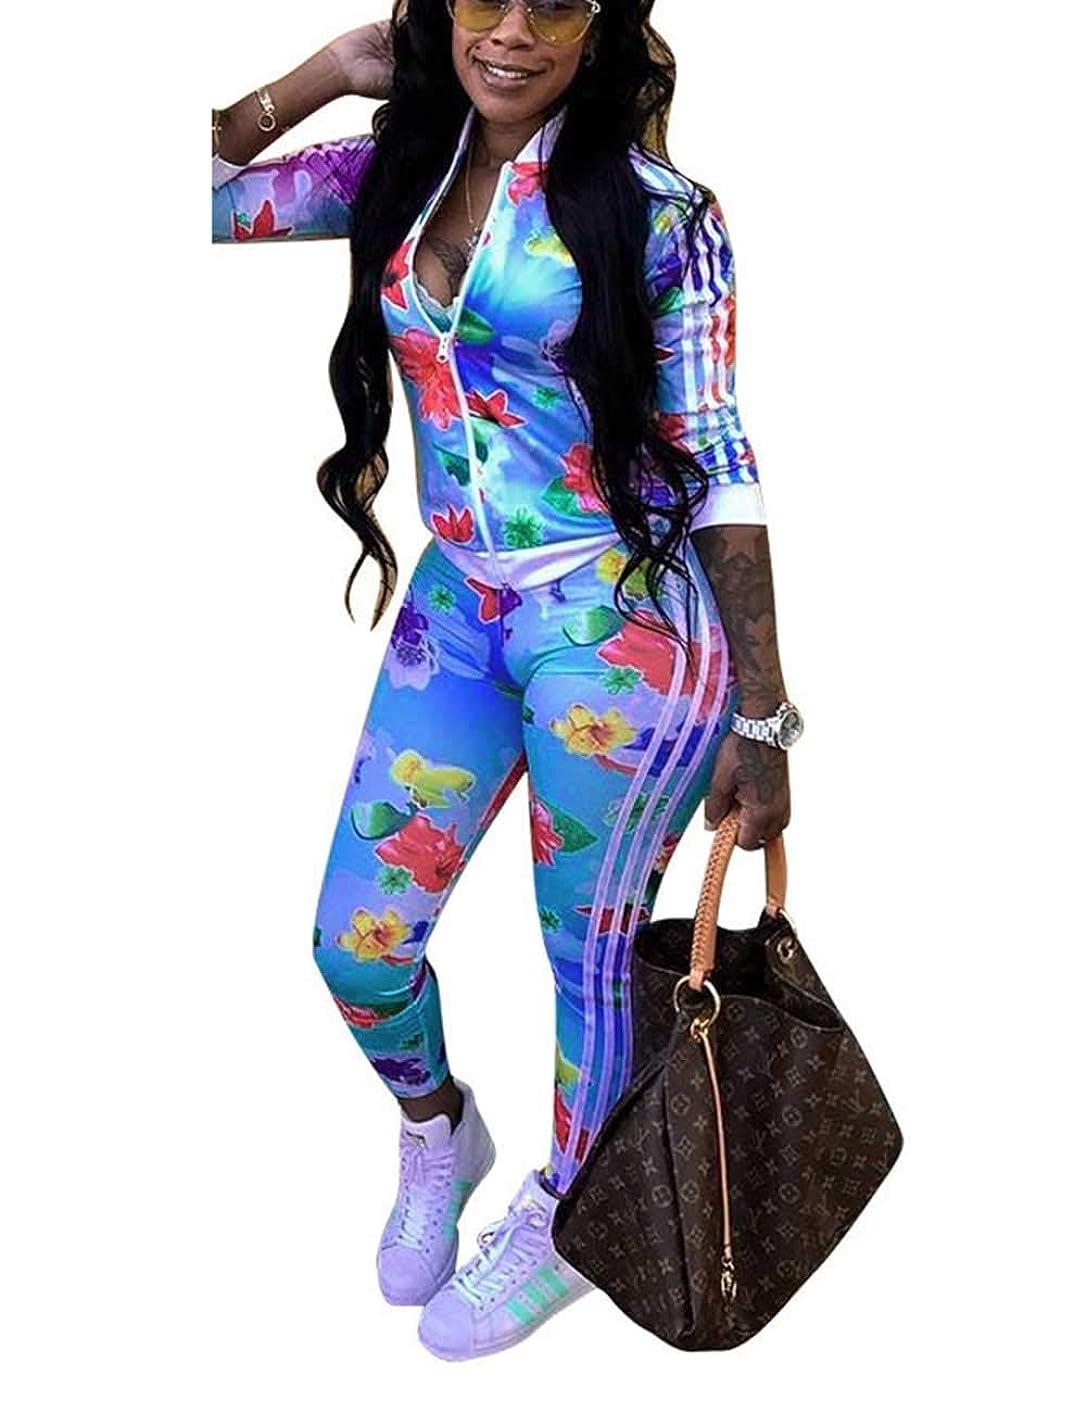 Angsuttc Women Floral Print Tracksuit 2 Piece Outfit Zip Up Jacket Long Pants Set